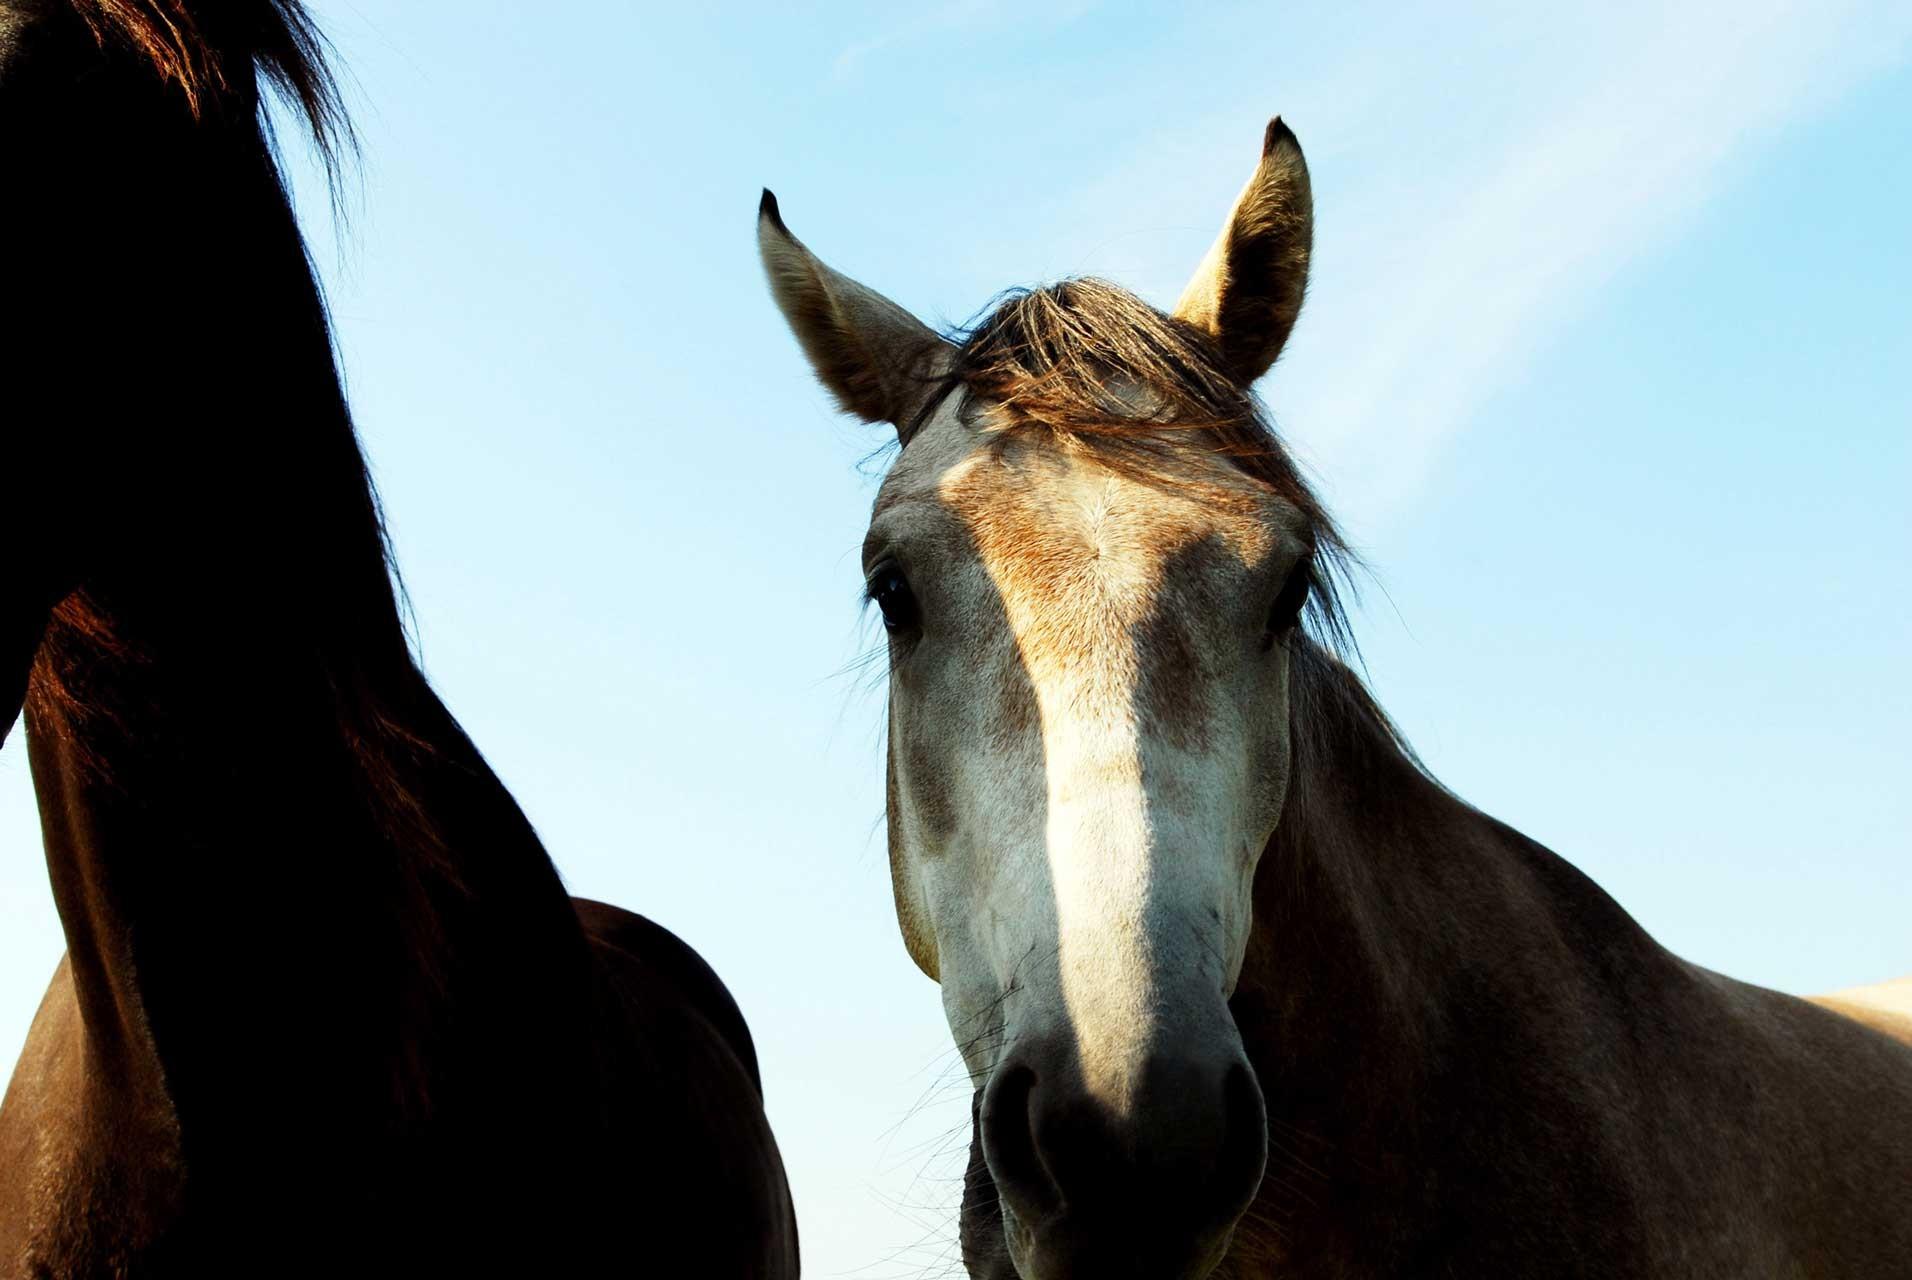 Laure-Maud_photographe_07_chevaux-01